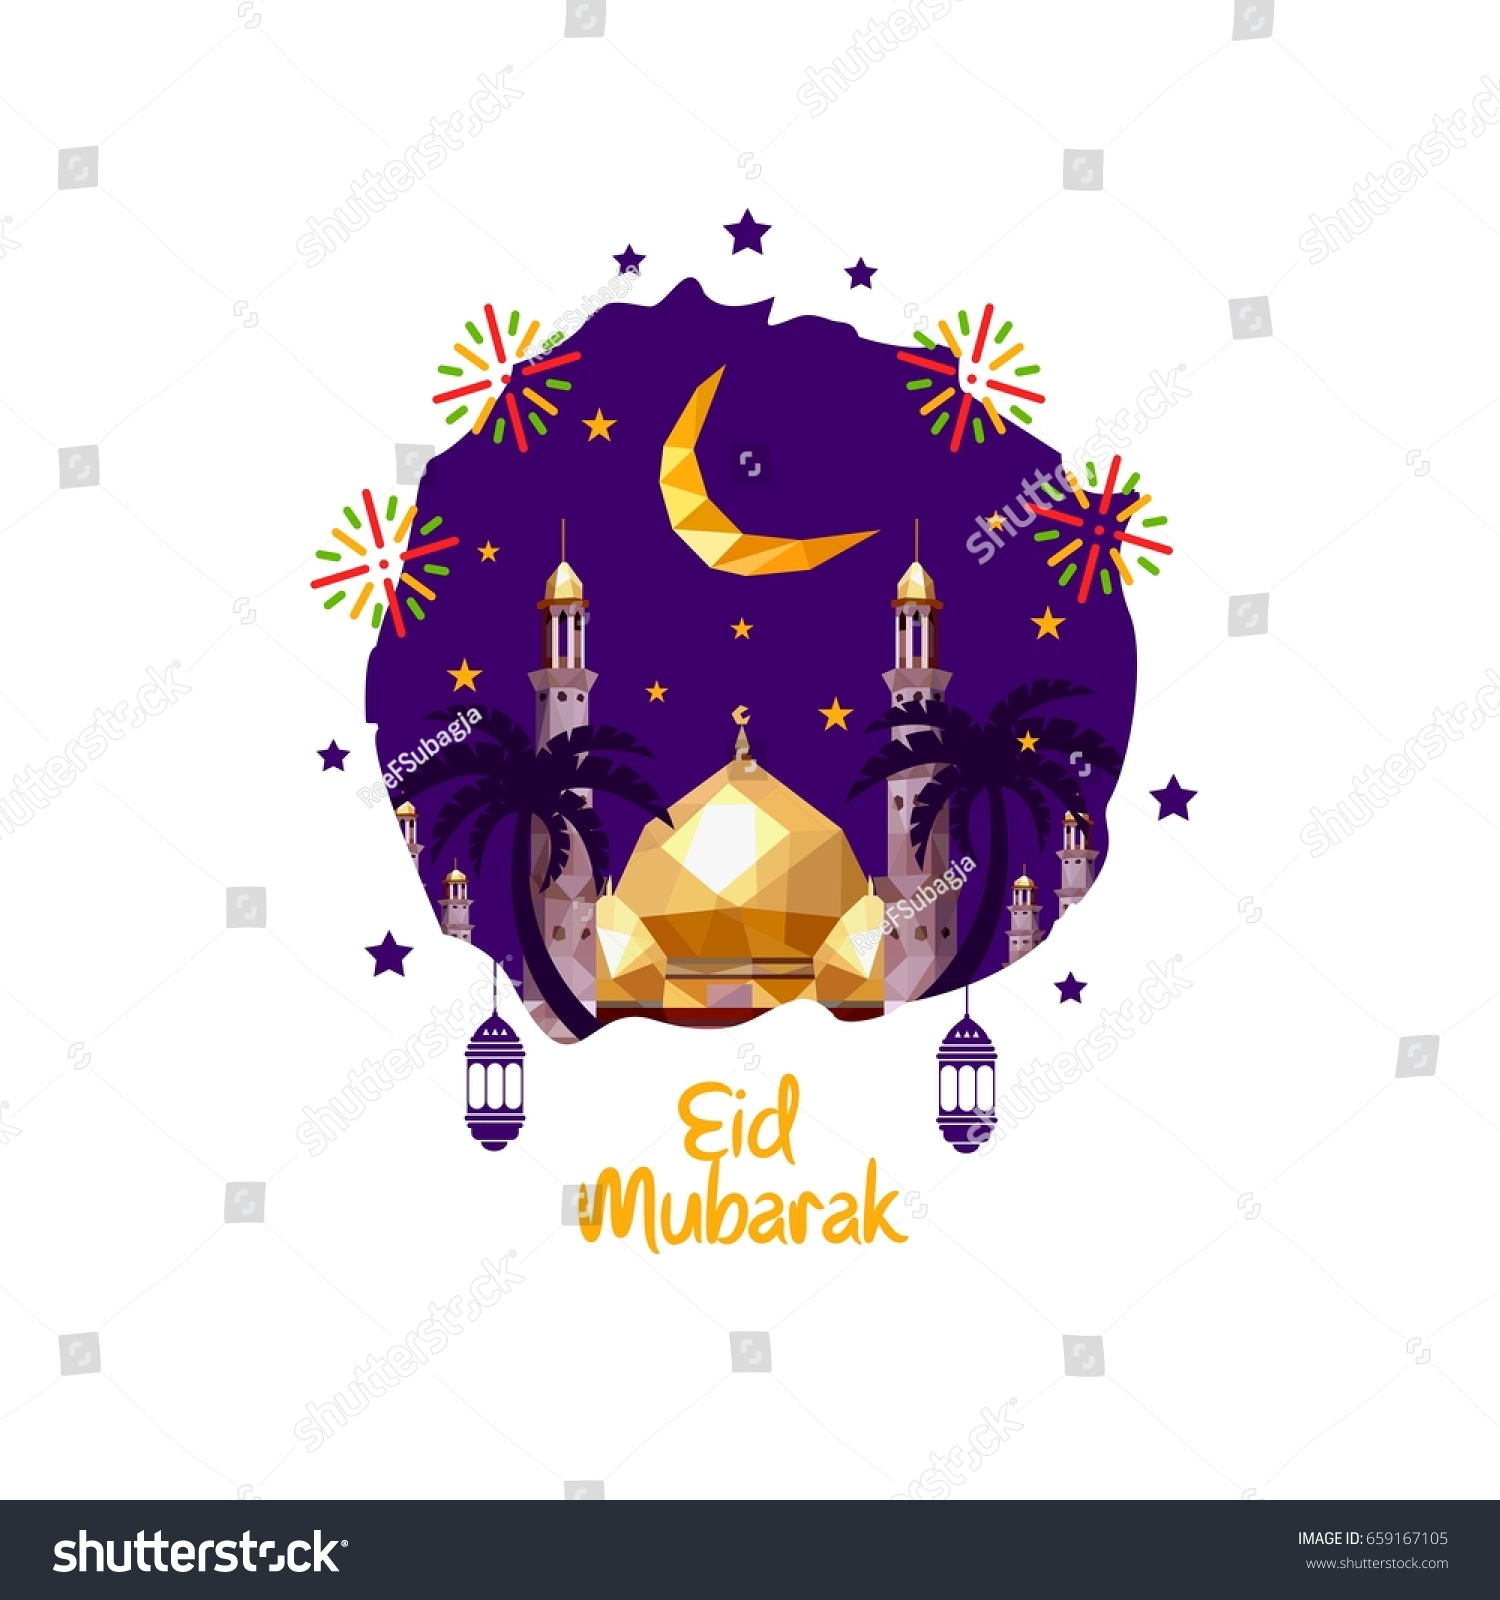 Eid Mubarak Poster Banner Vector Design Stock Vector Royalty Free 659167105